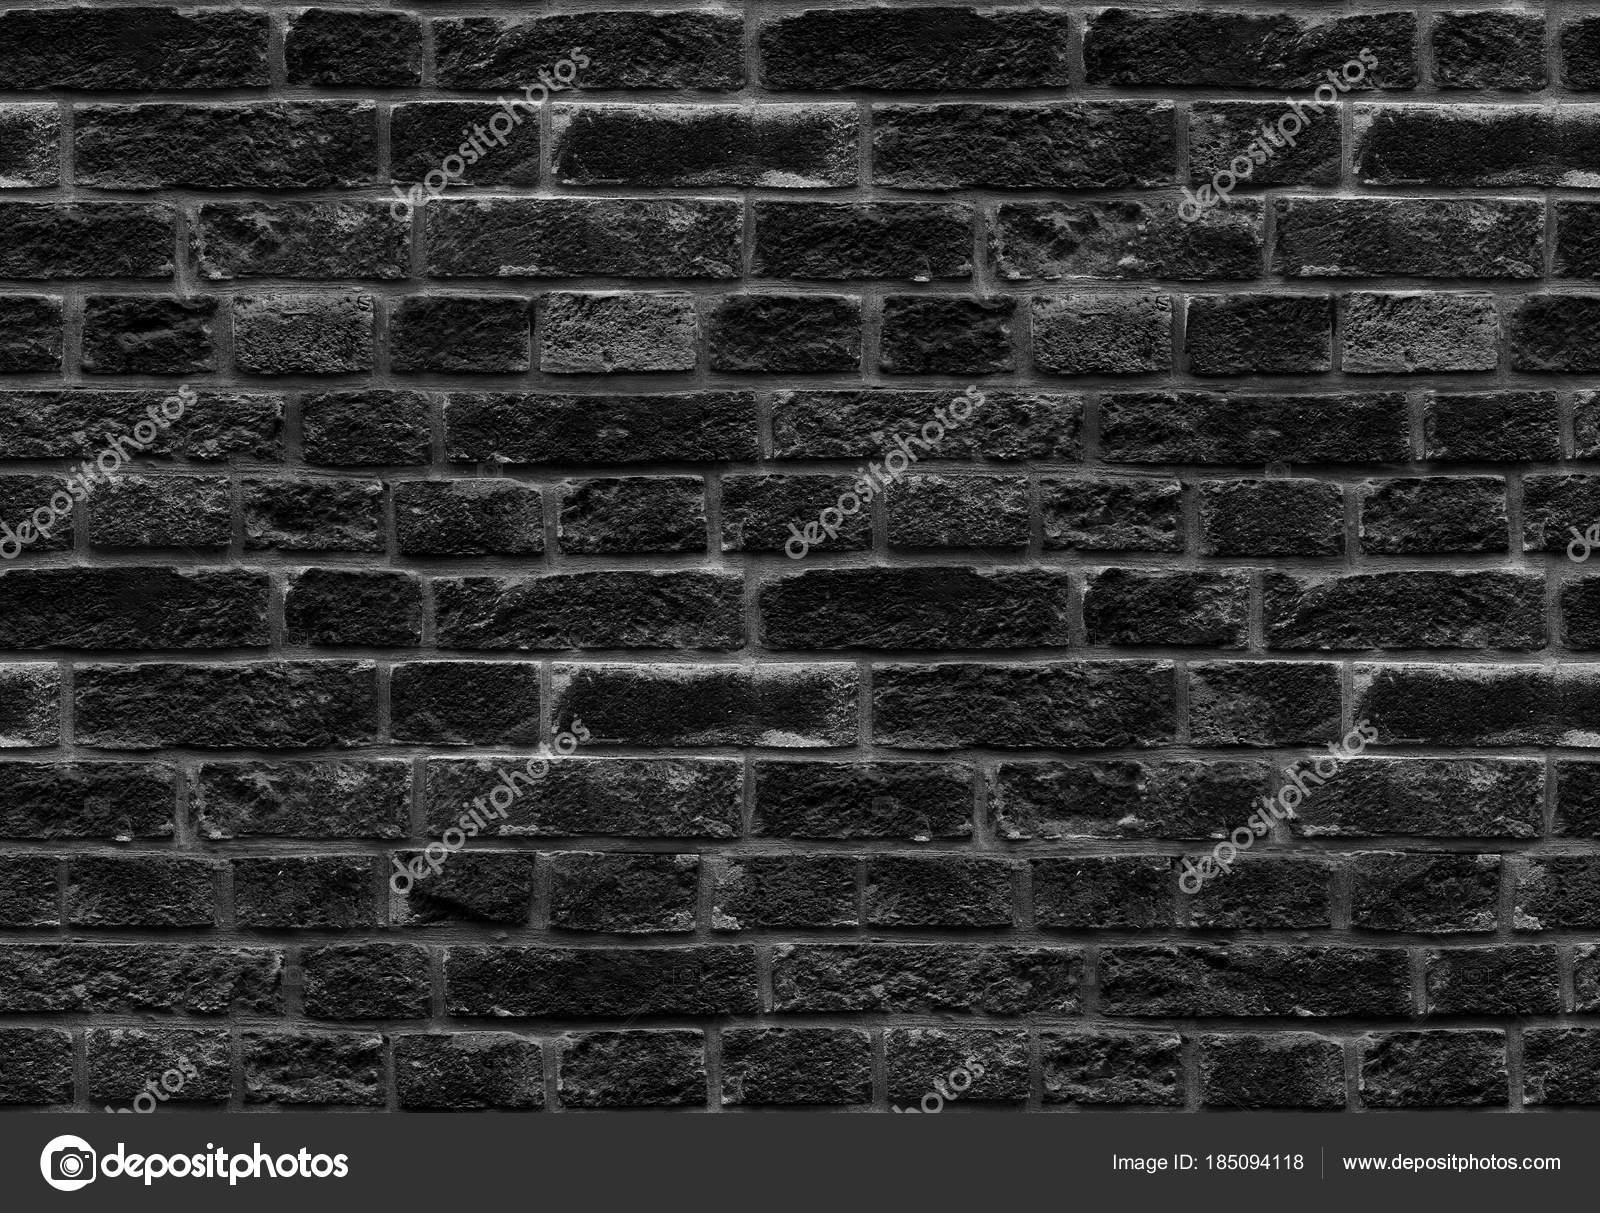 High Resolution Black Seamless Brick Wall Texture Pattern Background